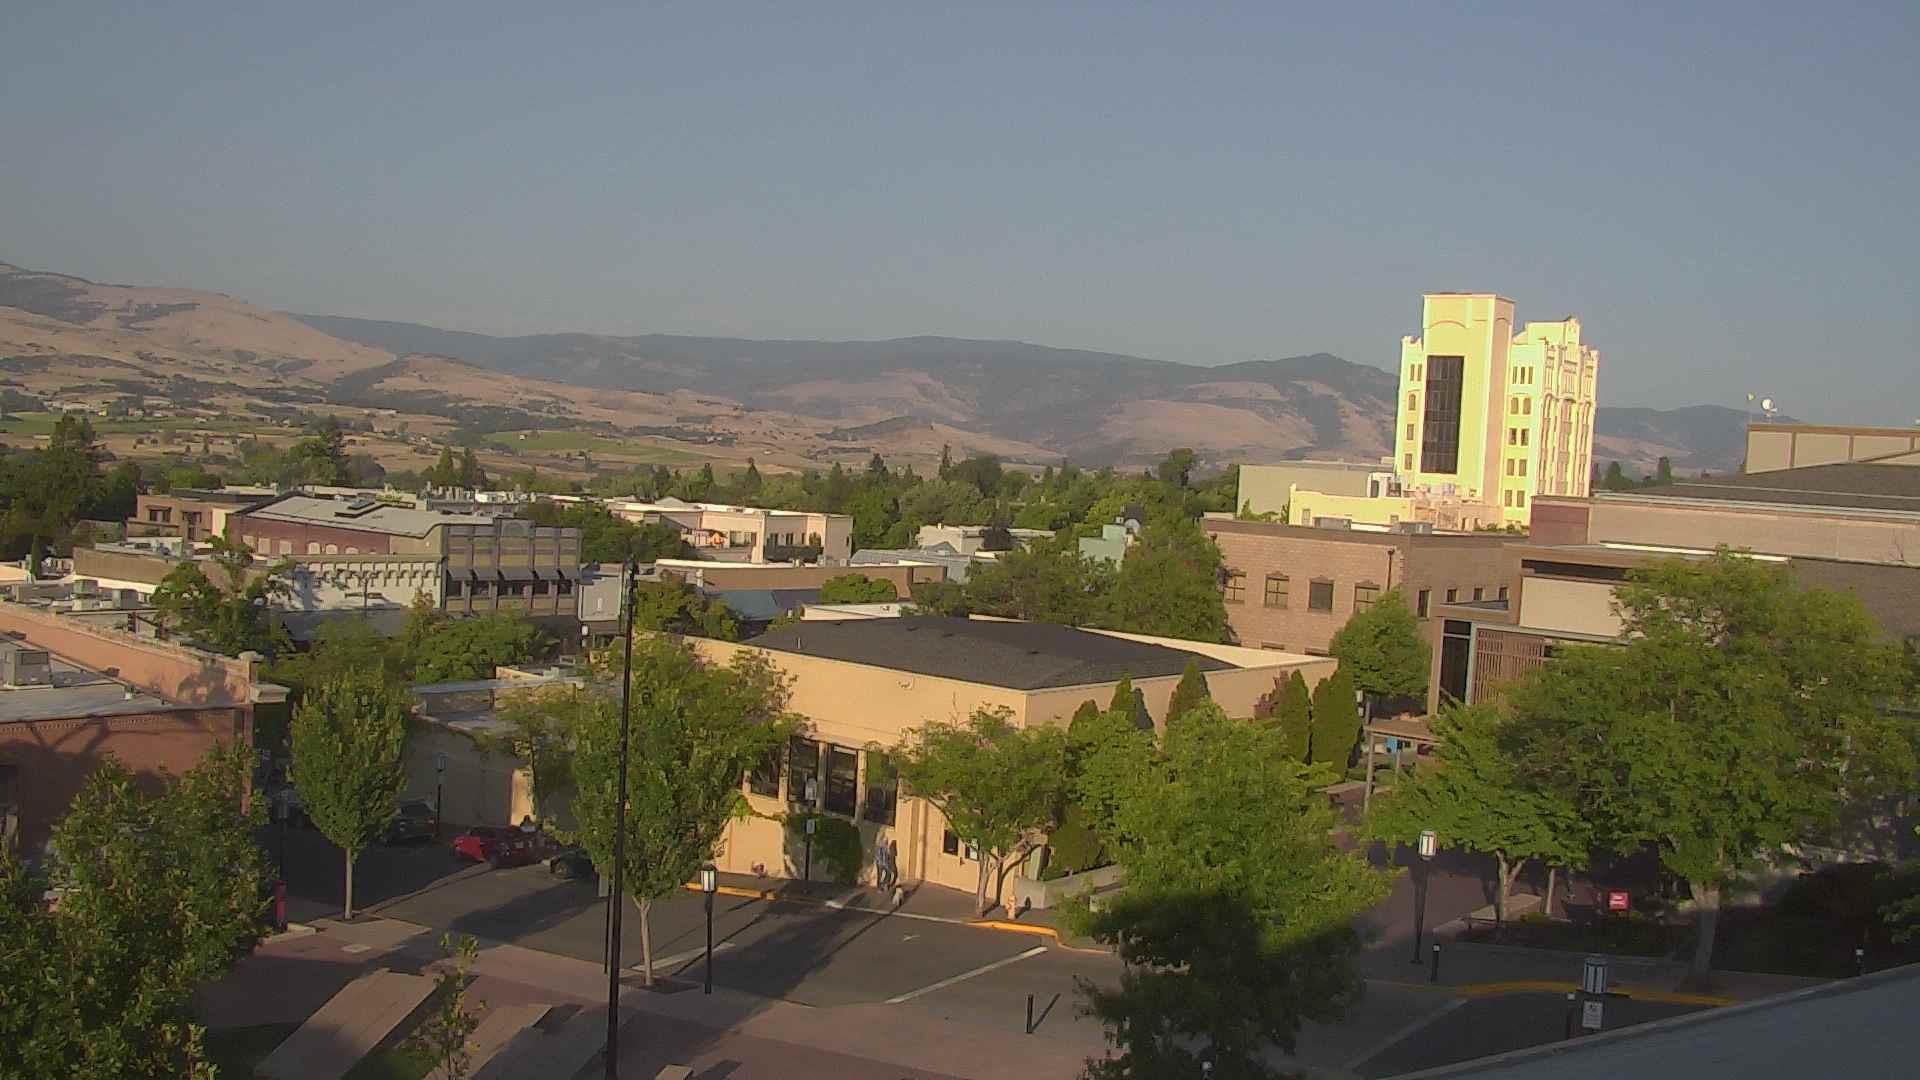 KDRV Weather Cam